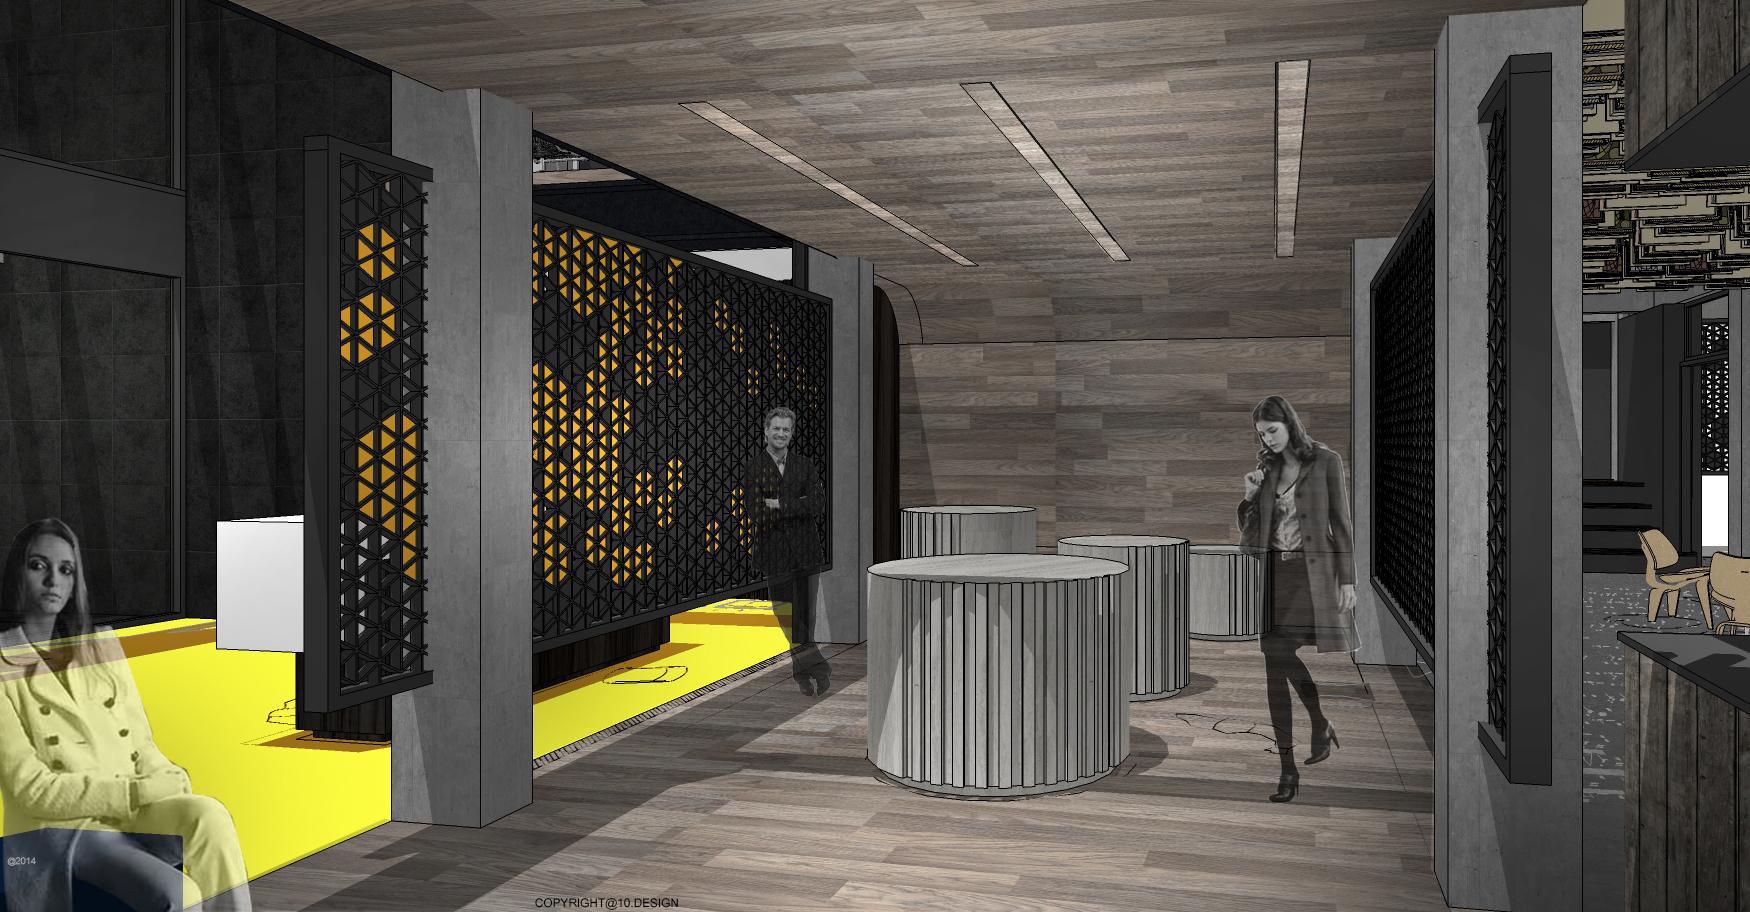 10DESIGN ookbee head office interior design start up THAILAND 02